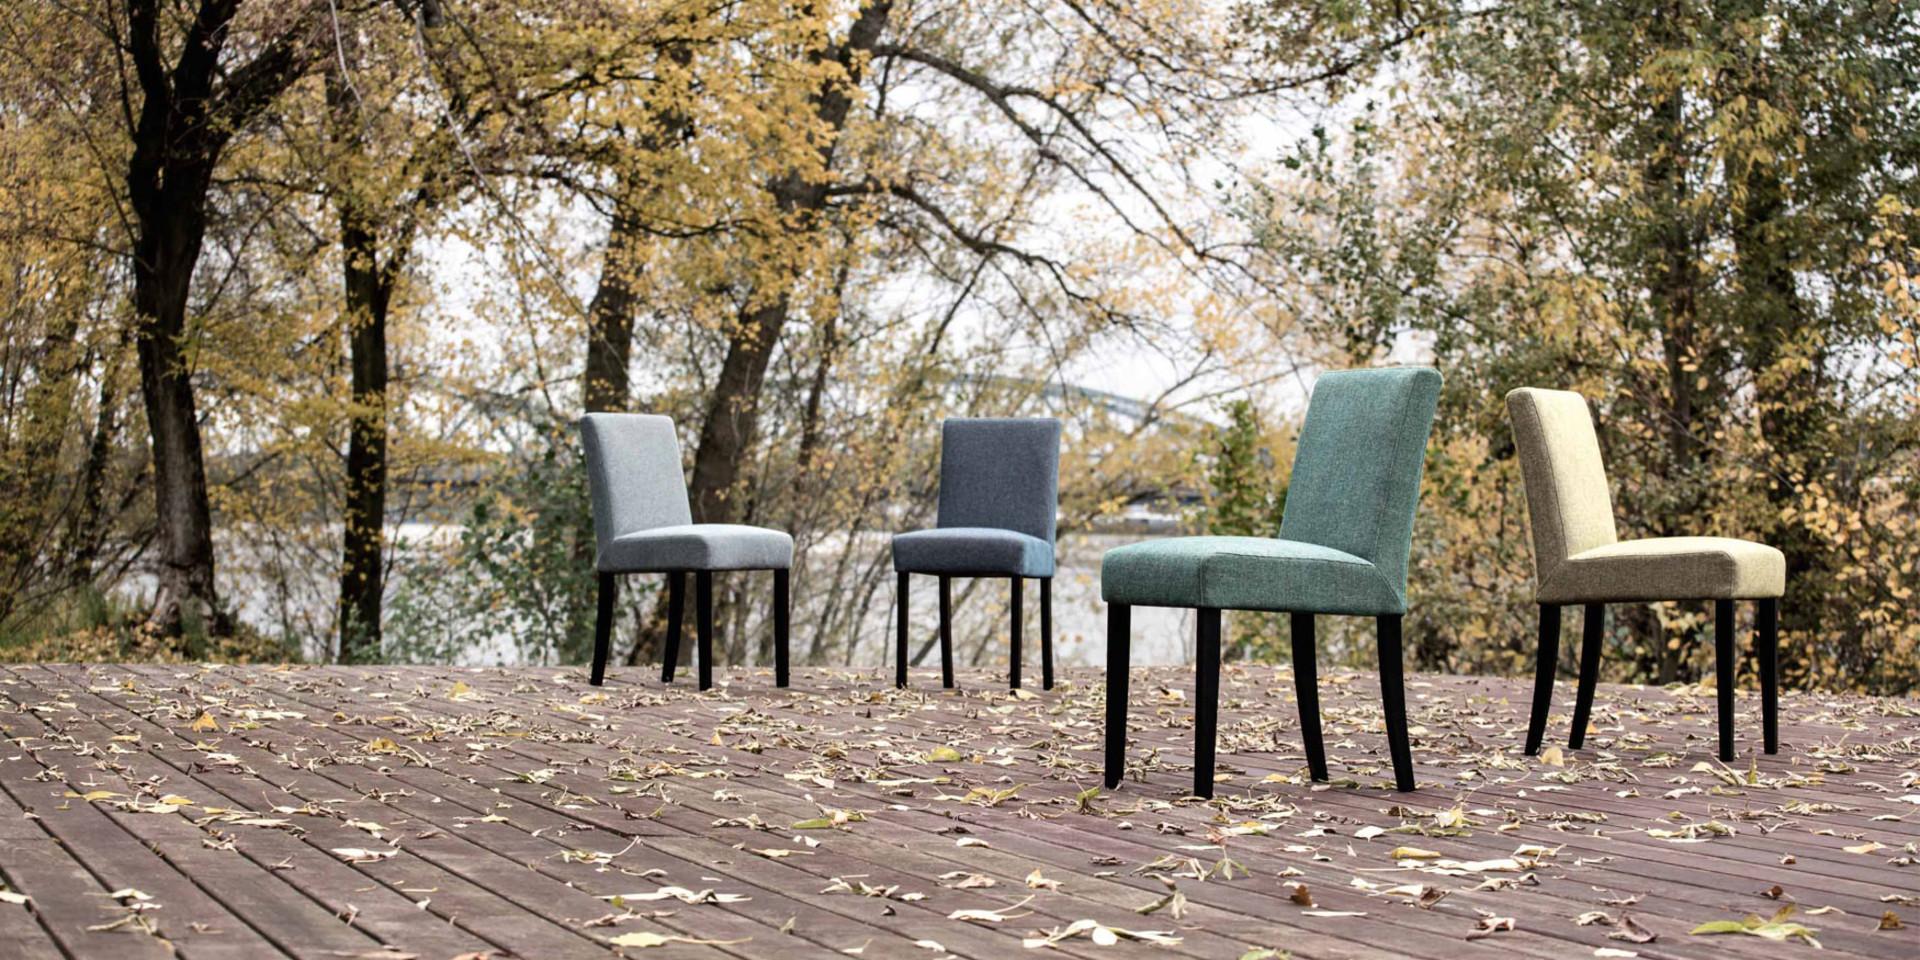 sits-vigo-ambiance-arrangement_chair_dover6_verde_dover5_dark_turquoise_dover7_green_dover8_mustard_5